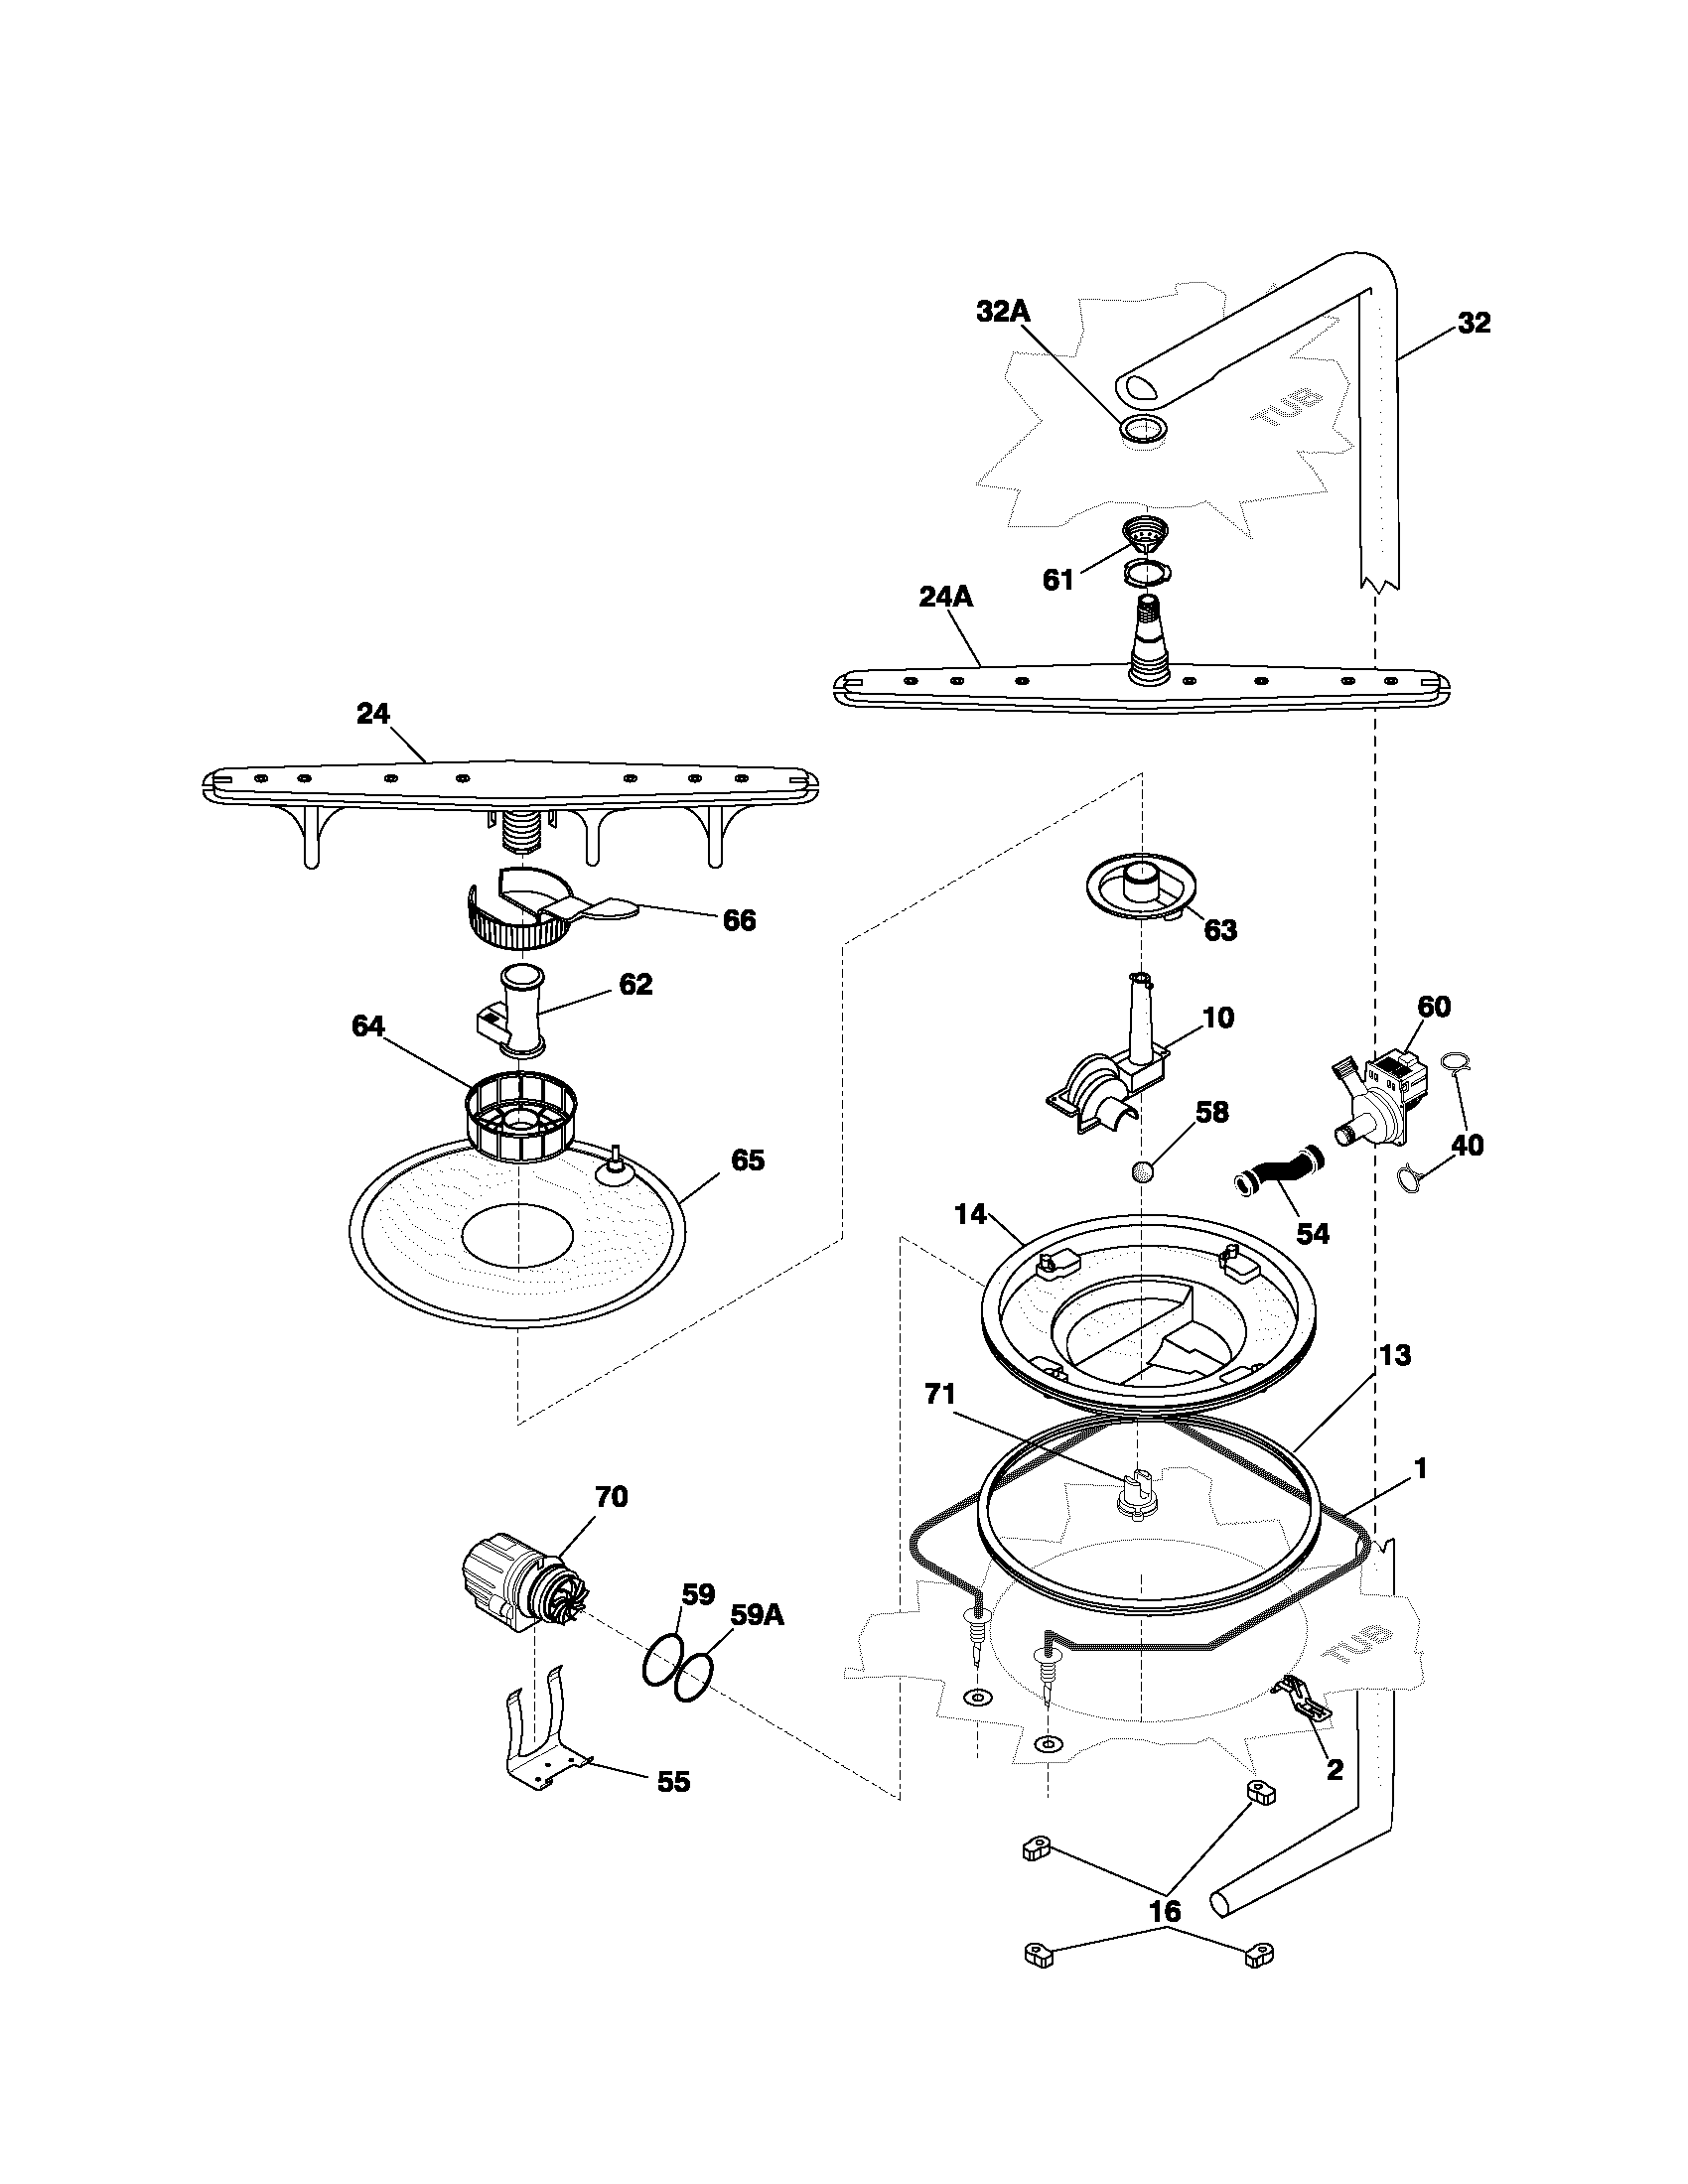 Frigidaire Gallery Dishwasher Wiring Diagram - Auto Electrical Wiring  Diagram